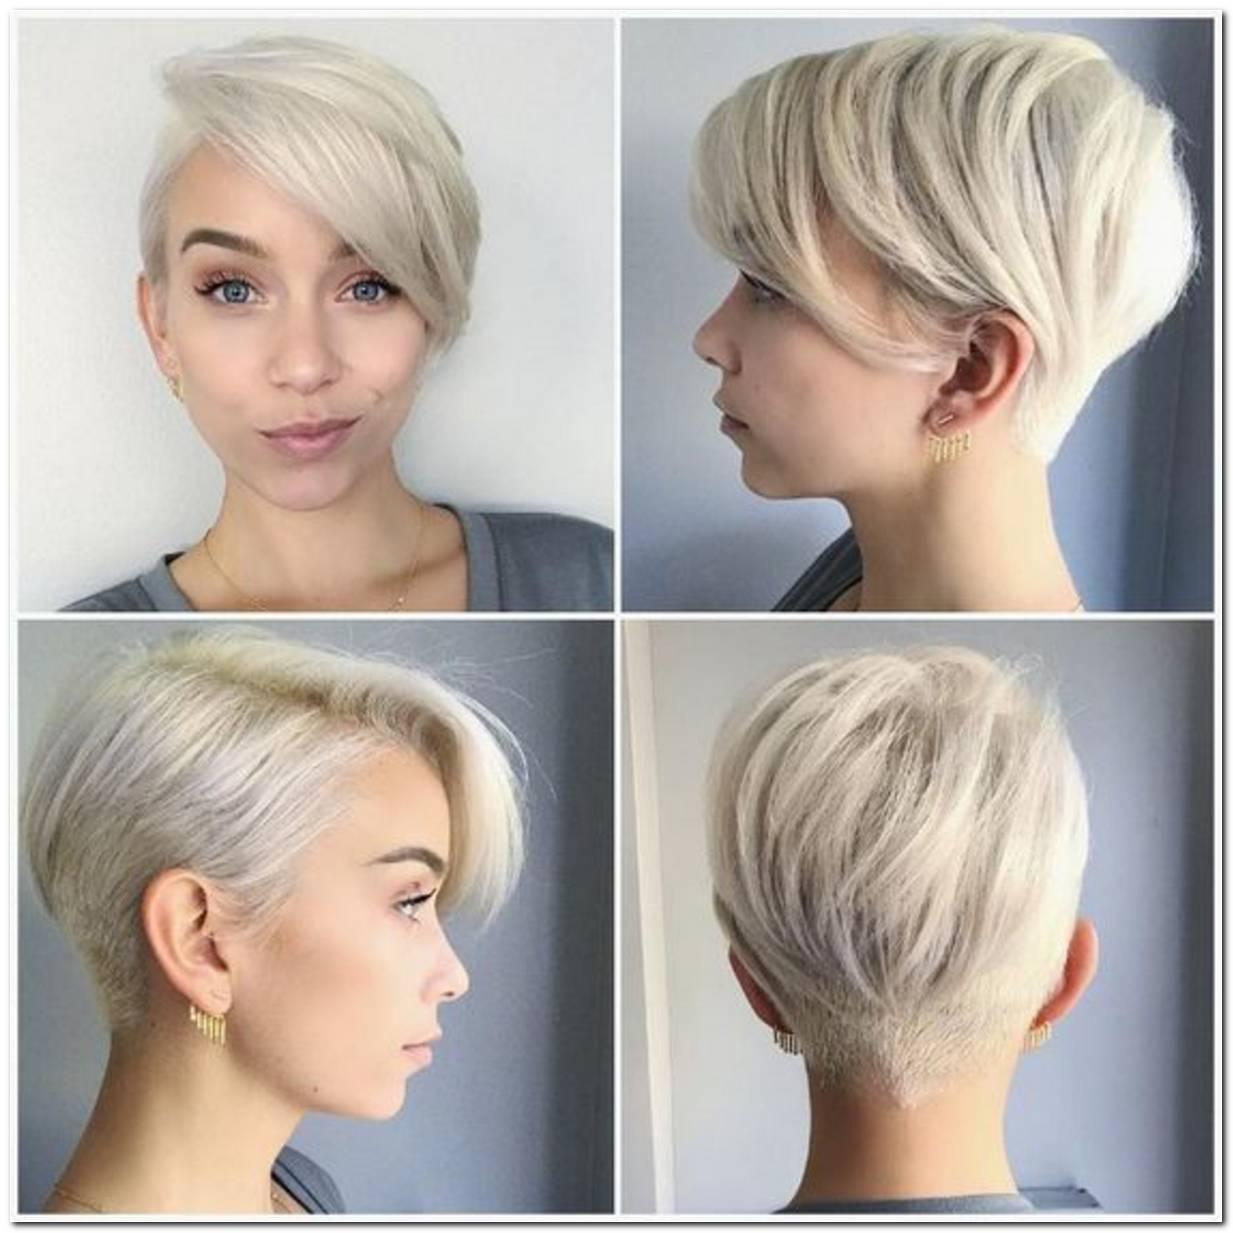 Frisuren Blond Kurz Damen Bilder